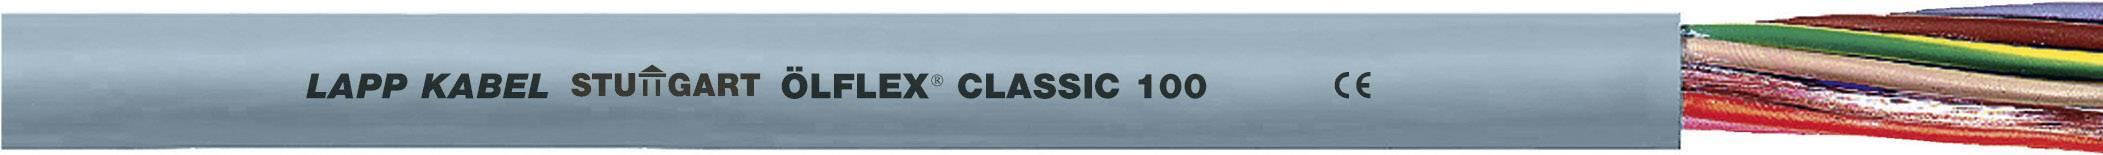 Kabel LappKabel Ölflex CLASSIC 100 4G50 (00101193), PVC, 34,5 mm, 750 V, šedá, 50 m